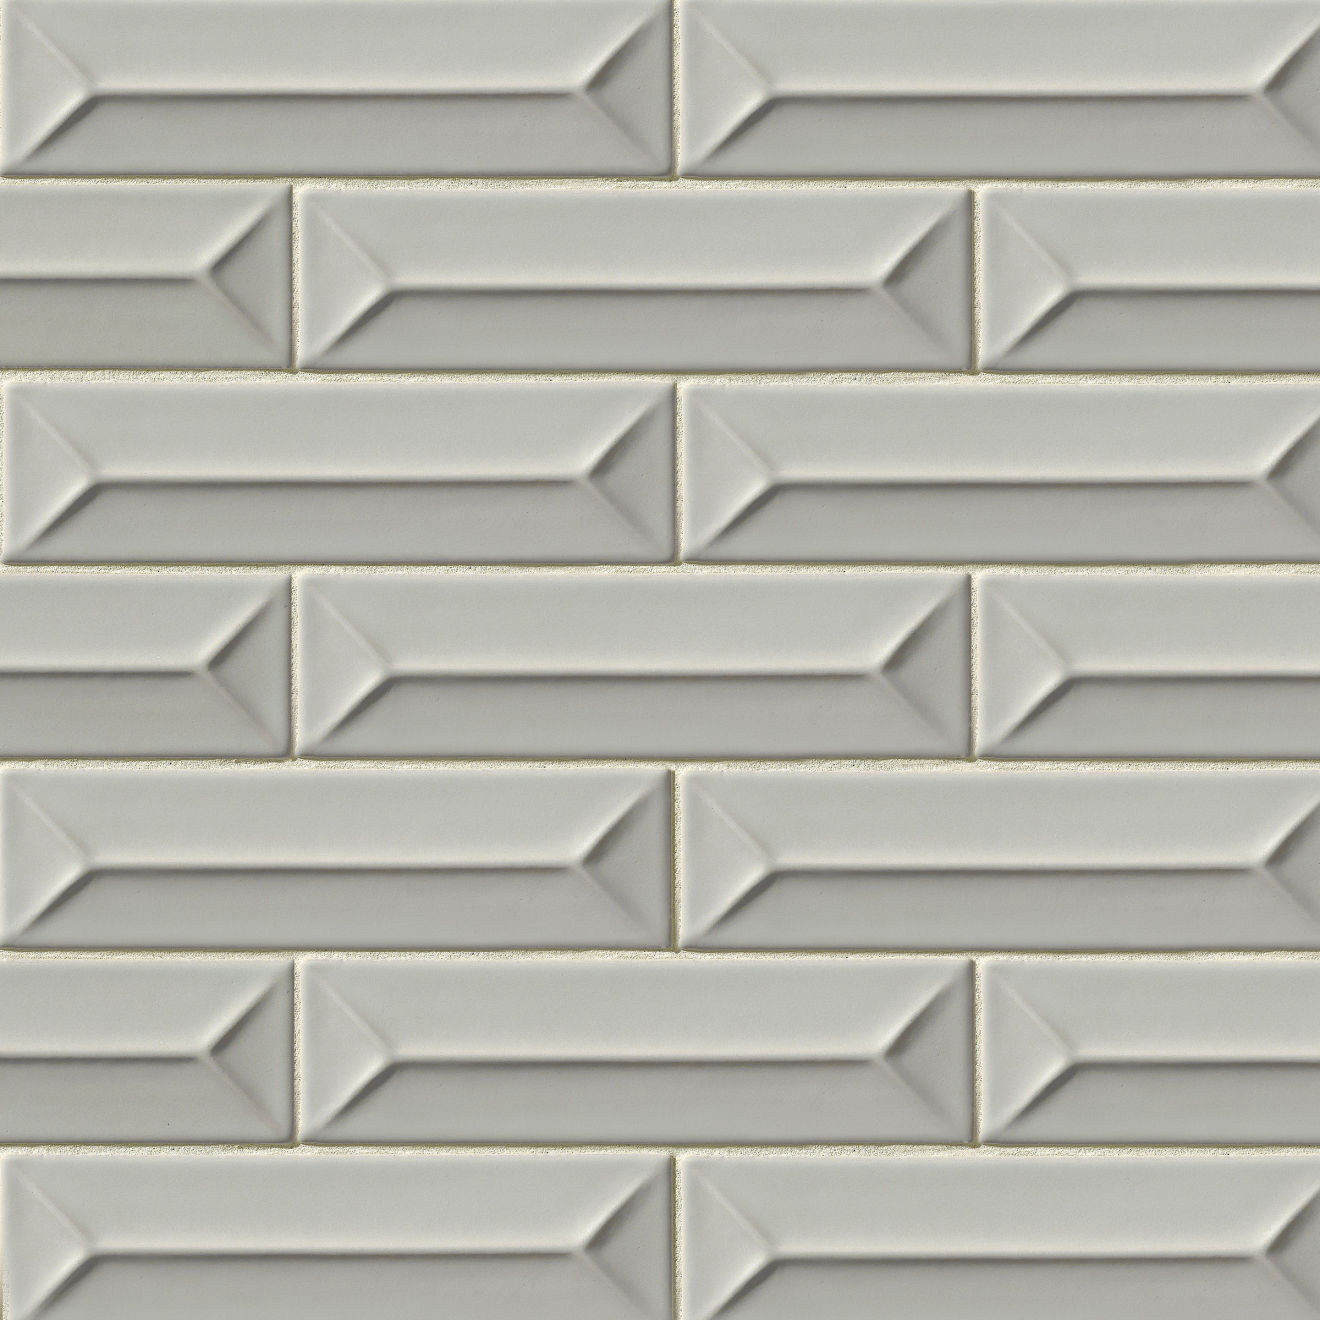 "Costa Allegra 2.5"" x 9"" Decorative Tile in Cinder"